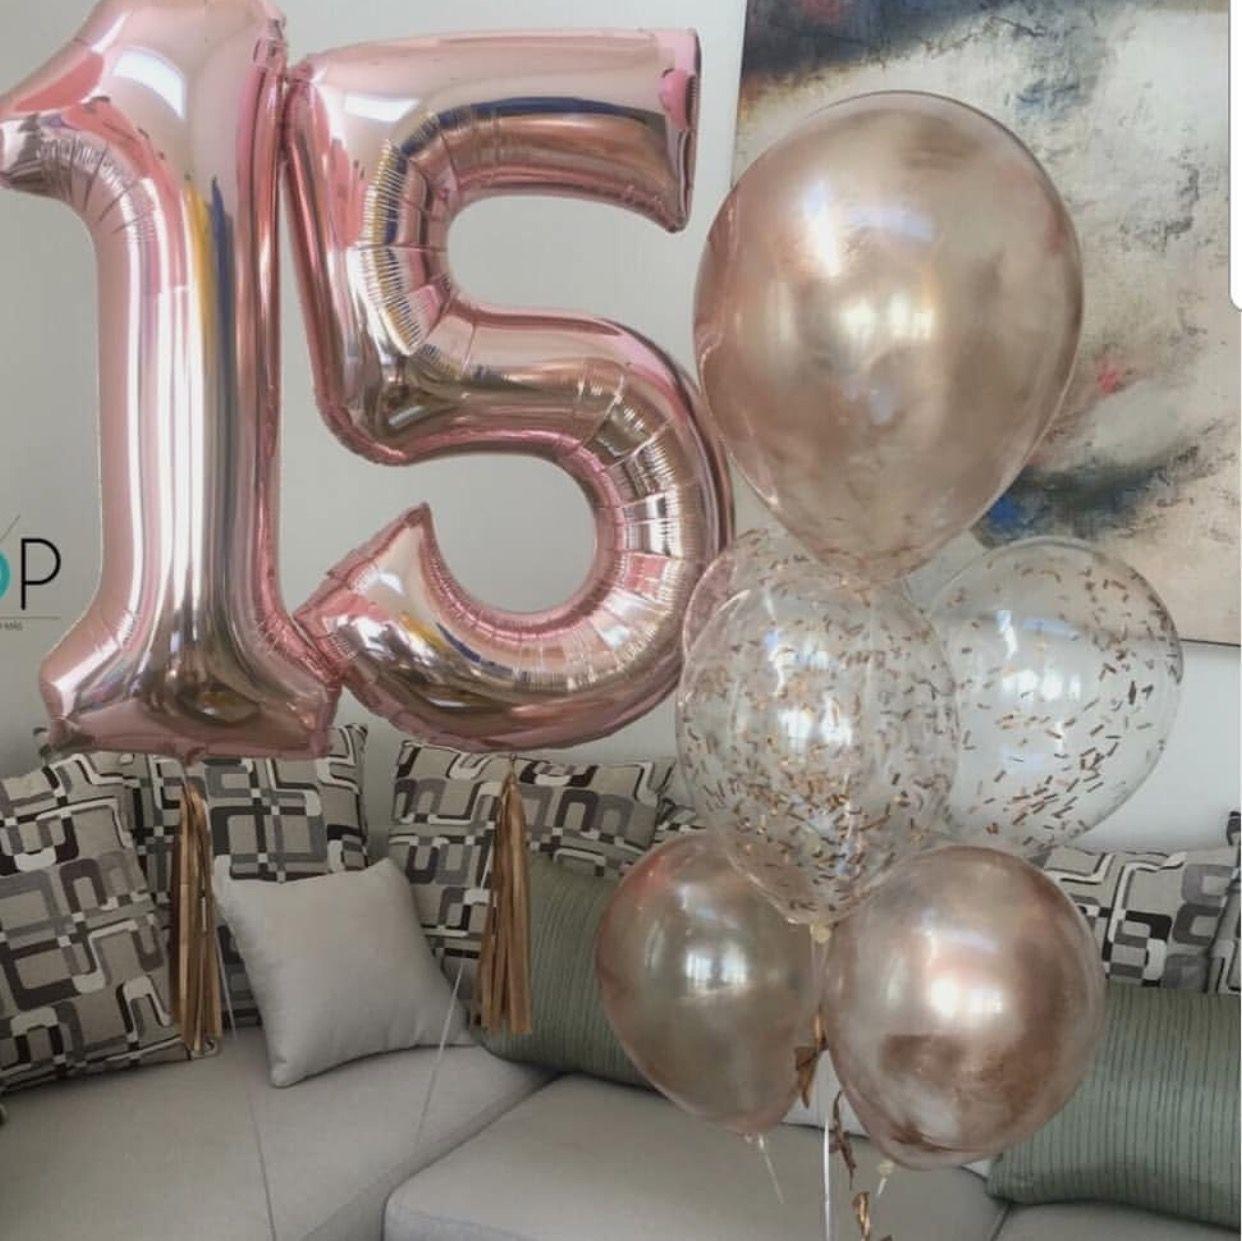 15th Birthday Pinterest Just4girls Happy 15th Birthday 15th Birthday Party Ideas Party Favors For Kids Birthday